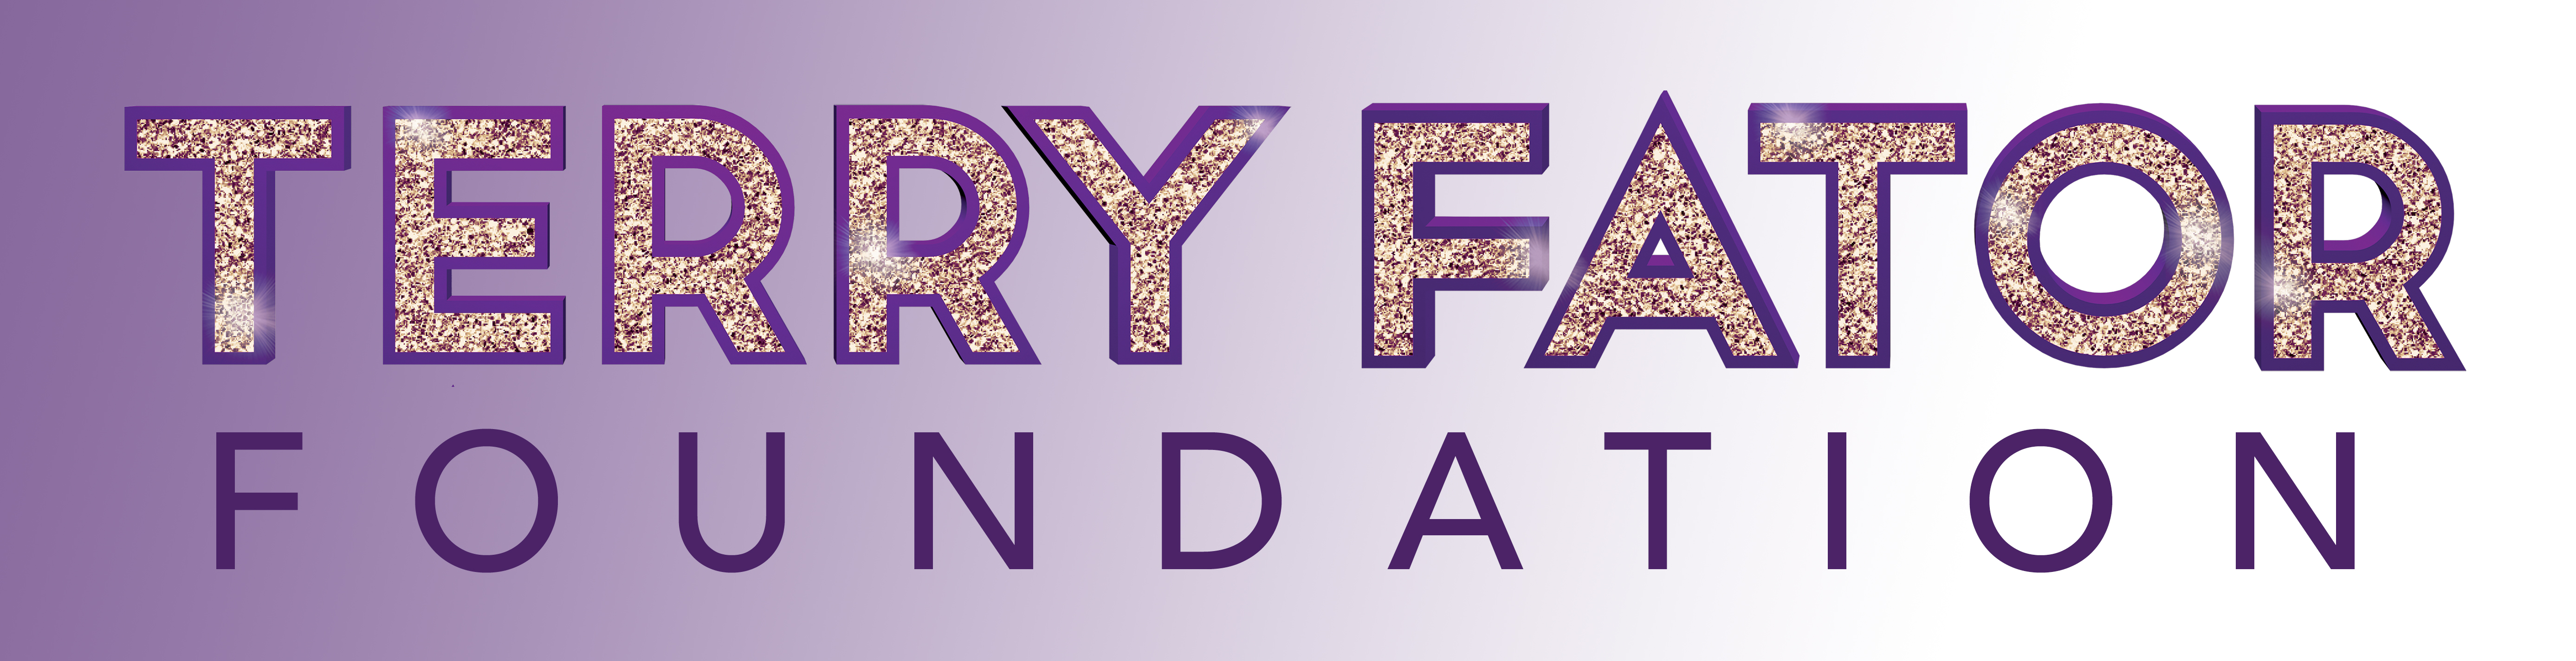 Terry Fator   Las Vegas Shows   Official Site